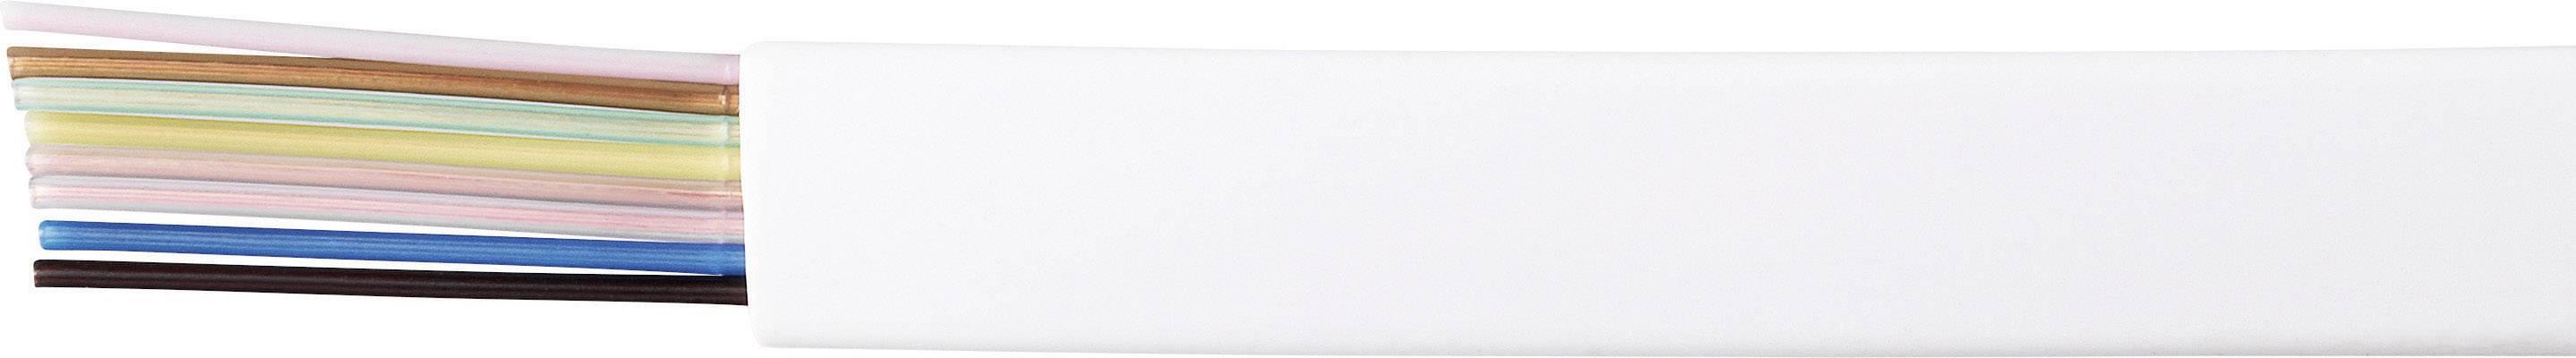 Telefónny kábel LiYY Kash 8 x 0.12 mm², biela, metrový tovar